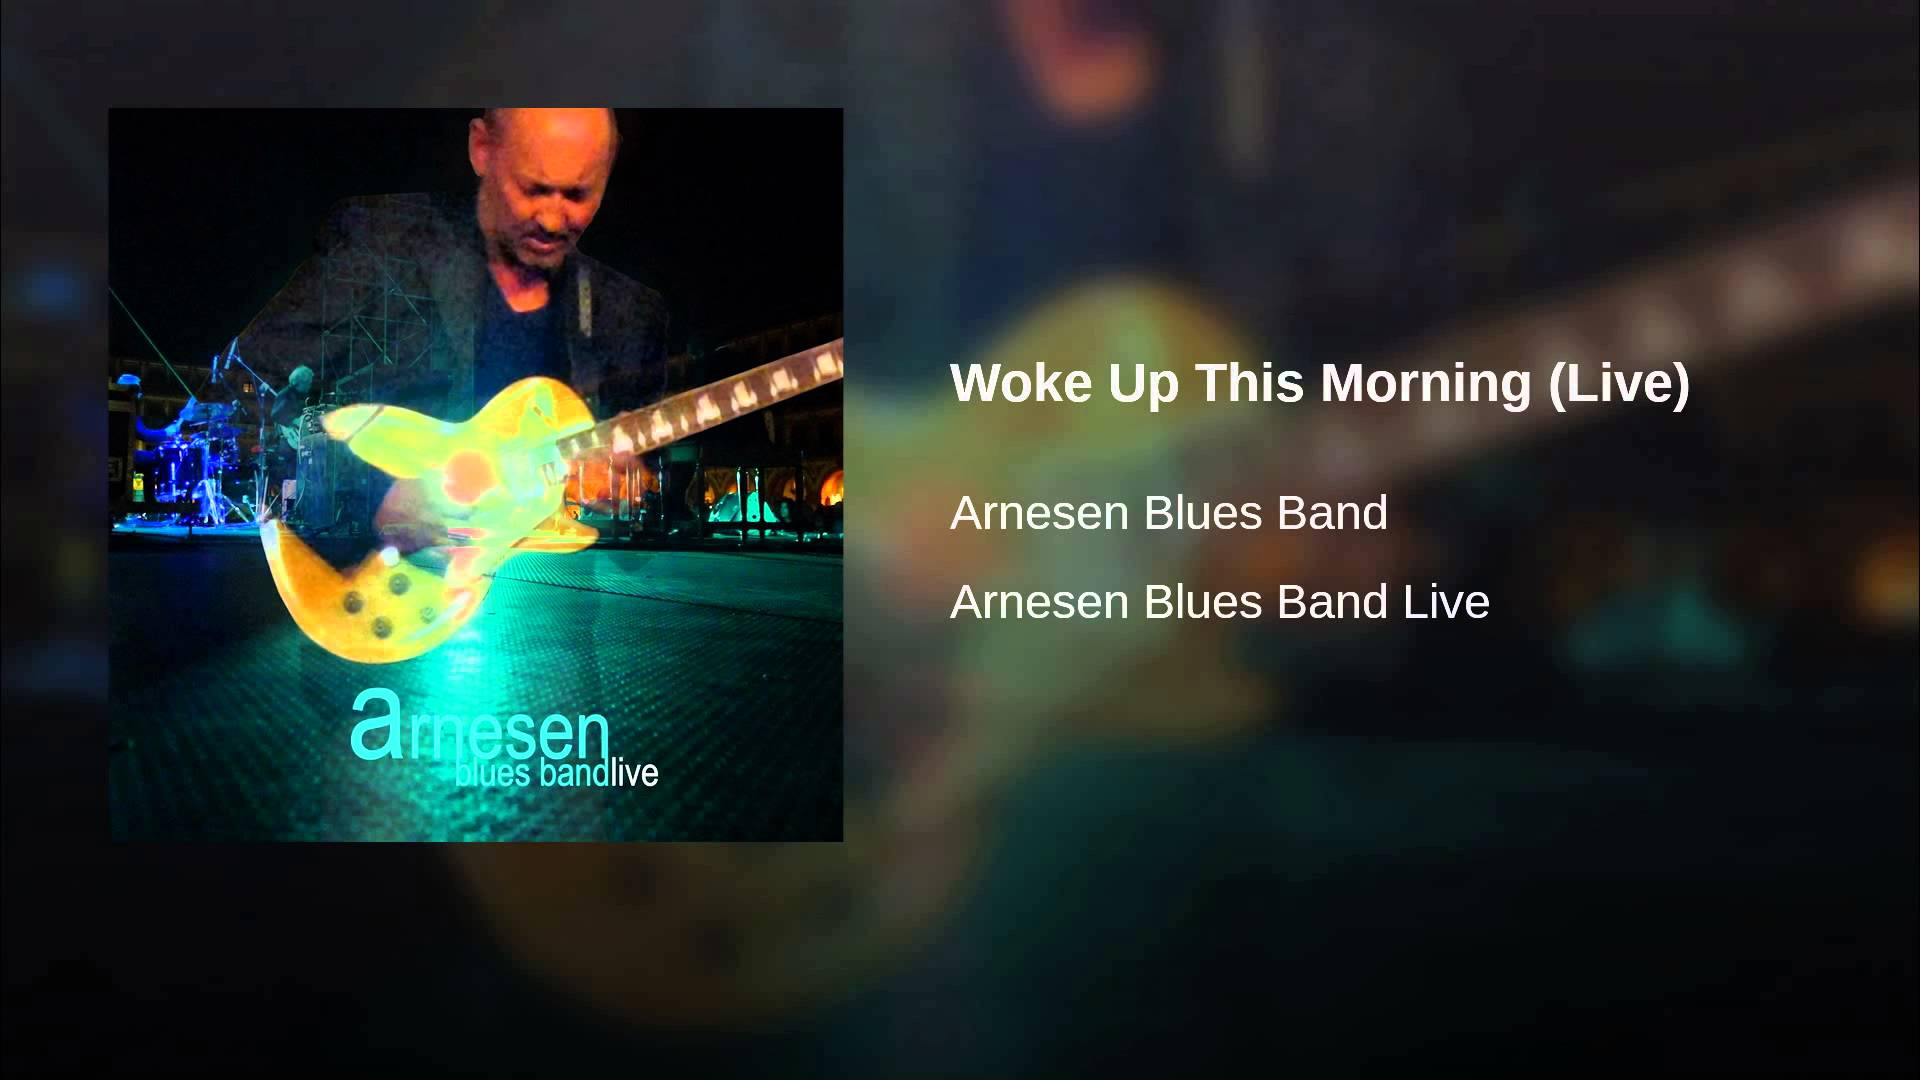 Woke Up This Morning (Live)